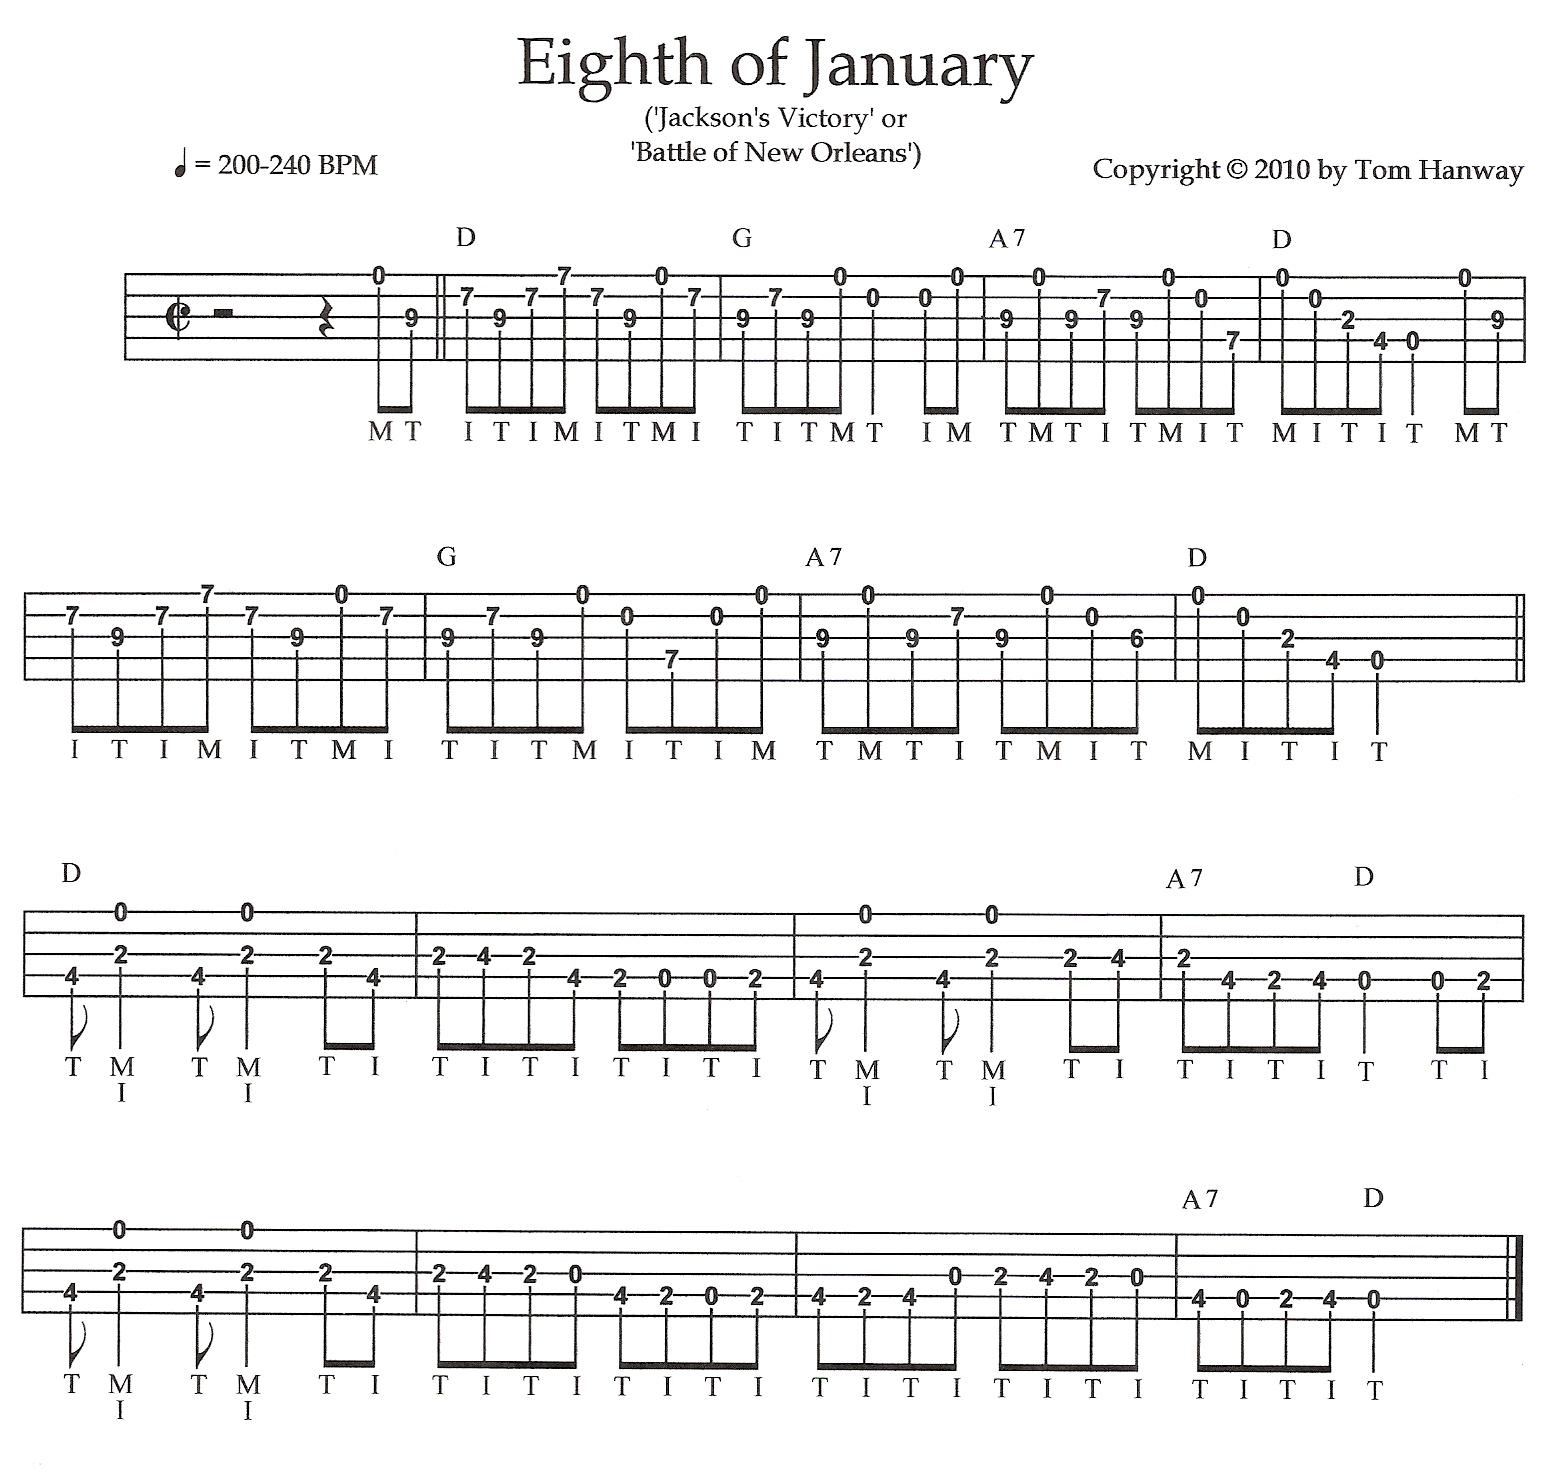 https://www.hangoutstorage.com/banjohangout.org/storage/tabs/e/tab-eighth-of-janua-12681-3034101012010.jpg